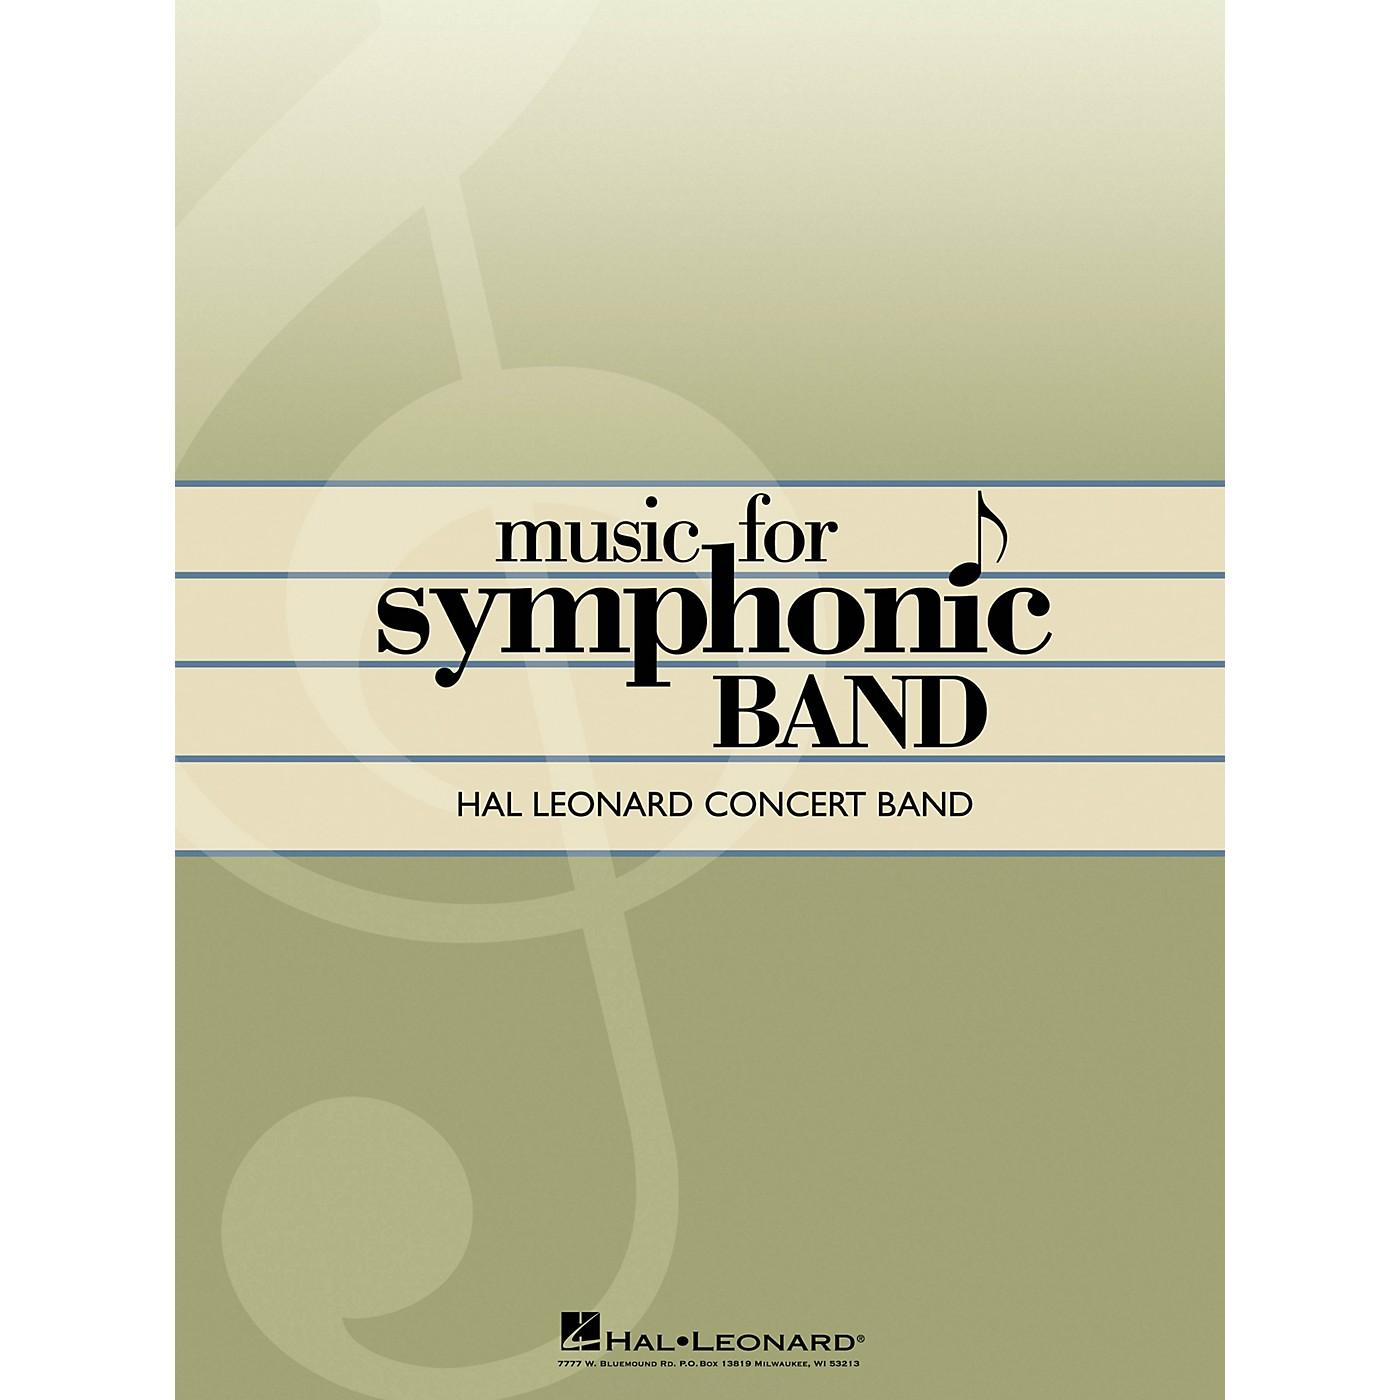 Hal Leonard A Christmas Fantasy Concert Band Level 4-5 Arranged by Calvin Custer thumbnail